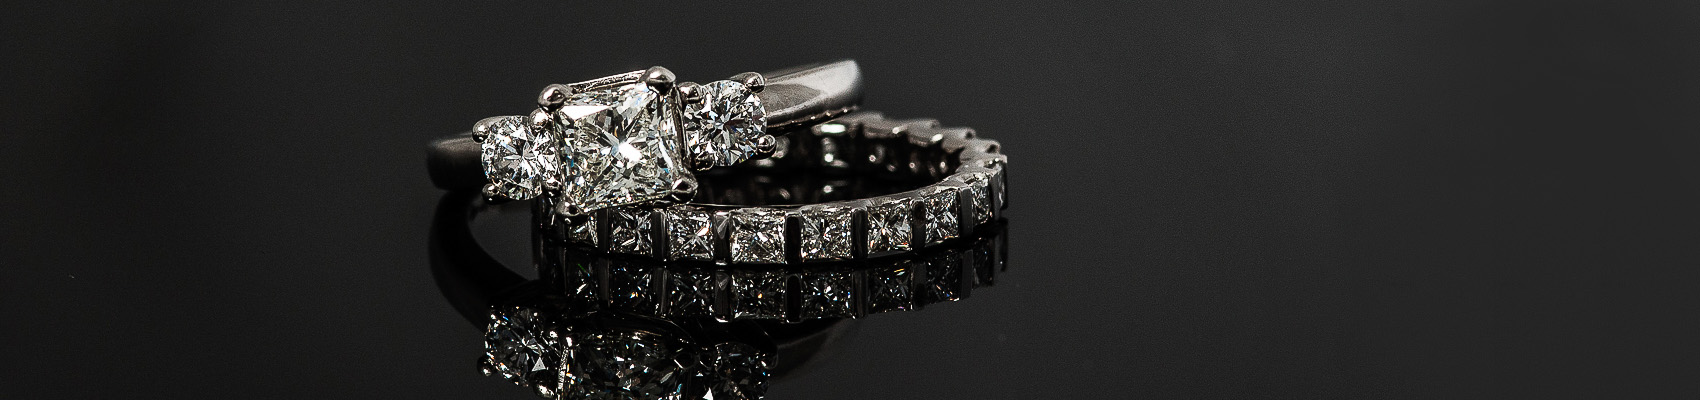 Jewelers on Long Island